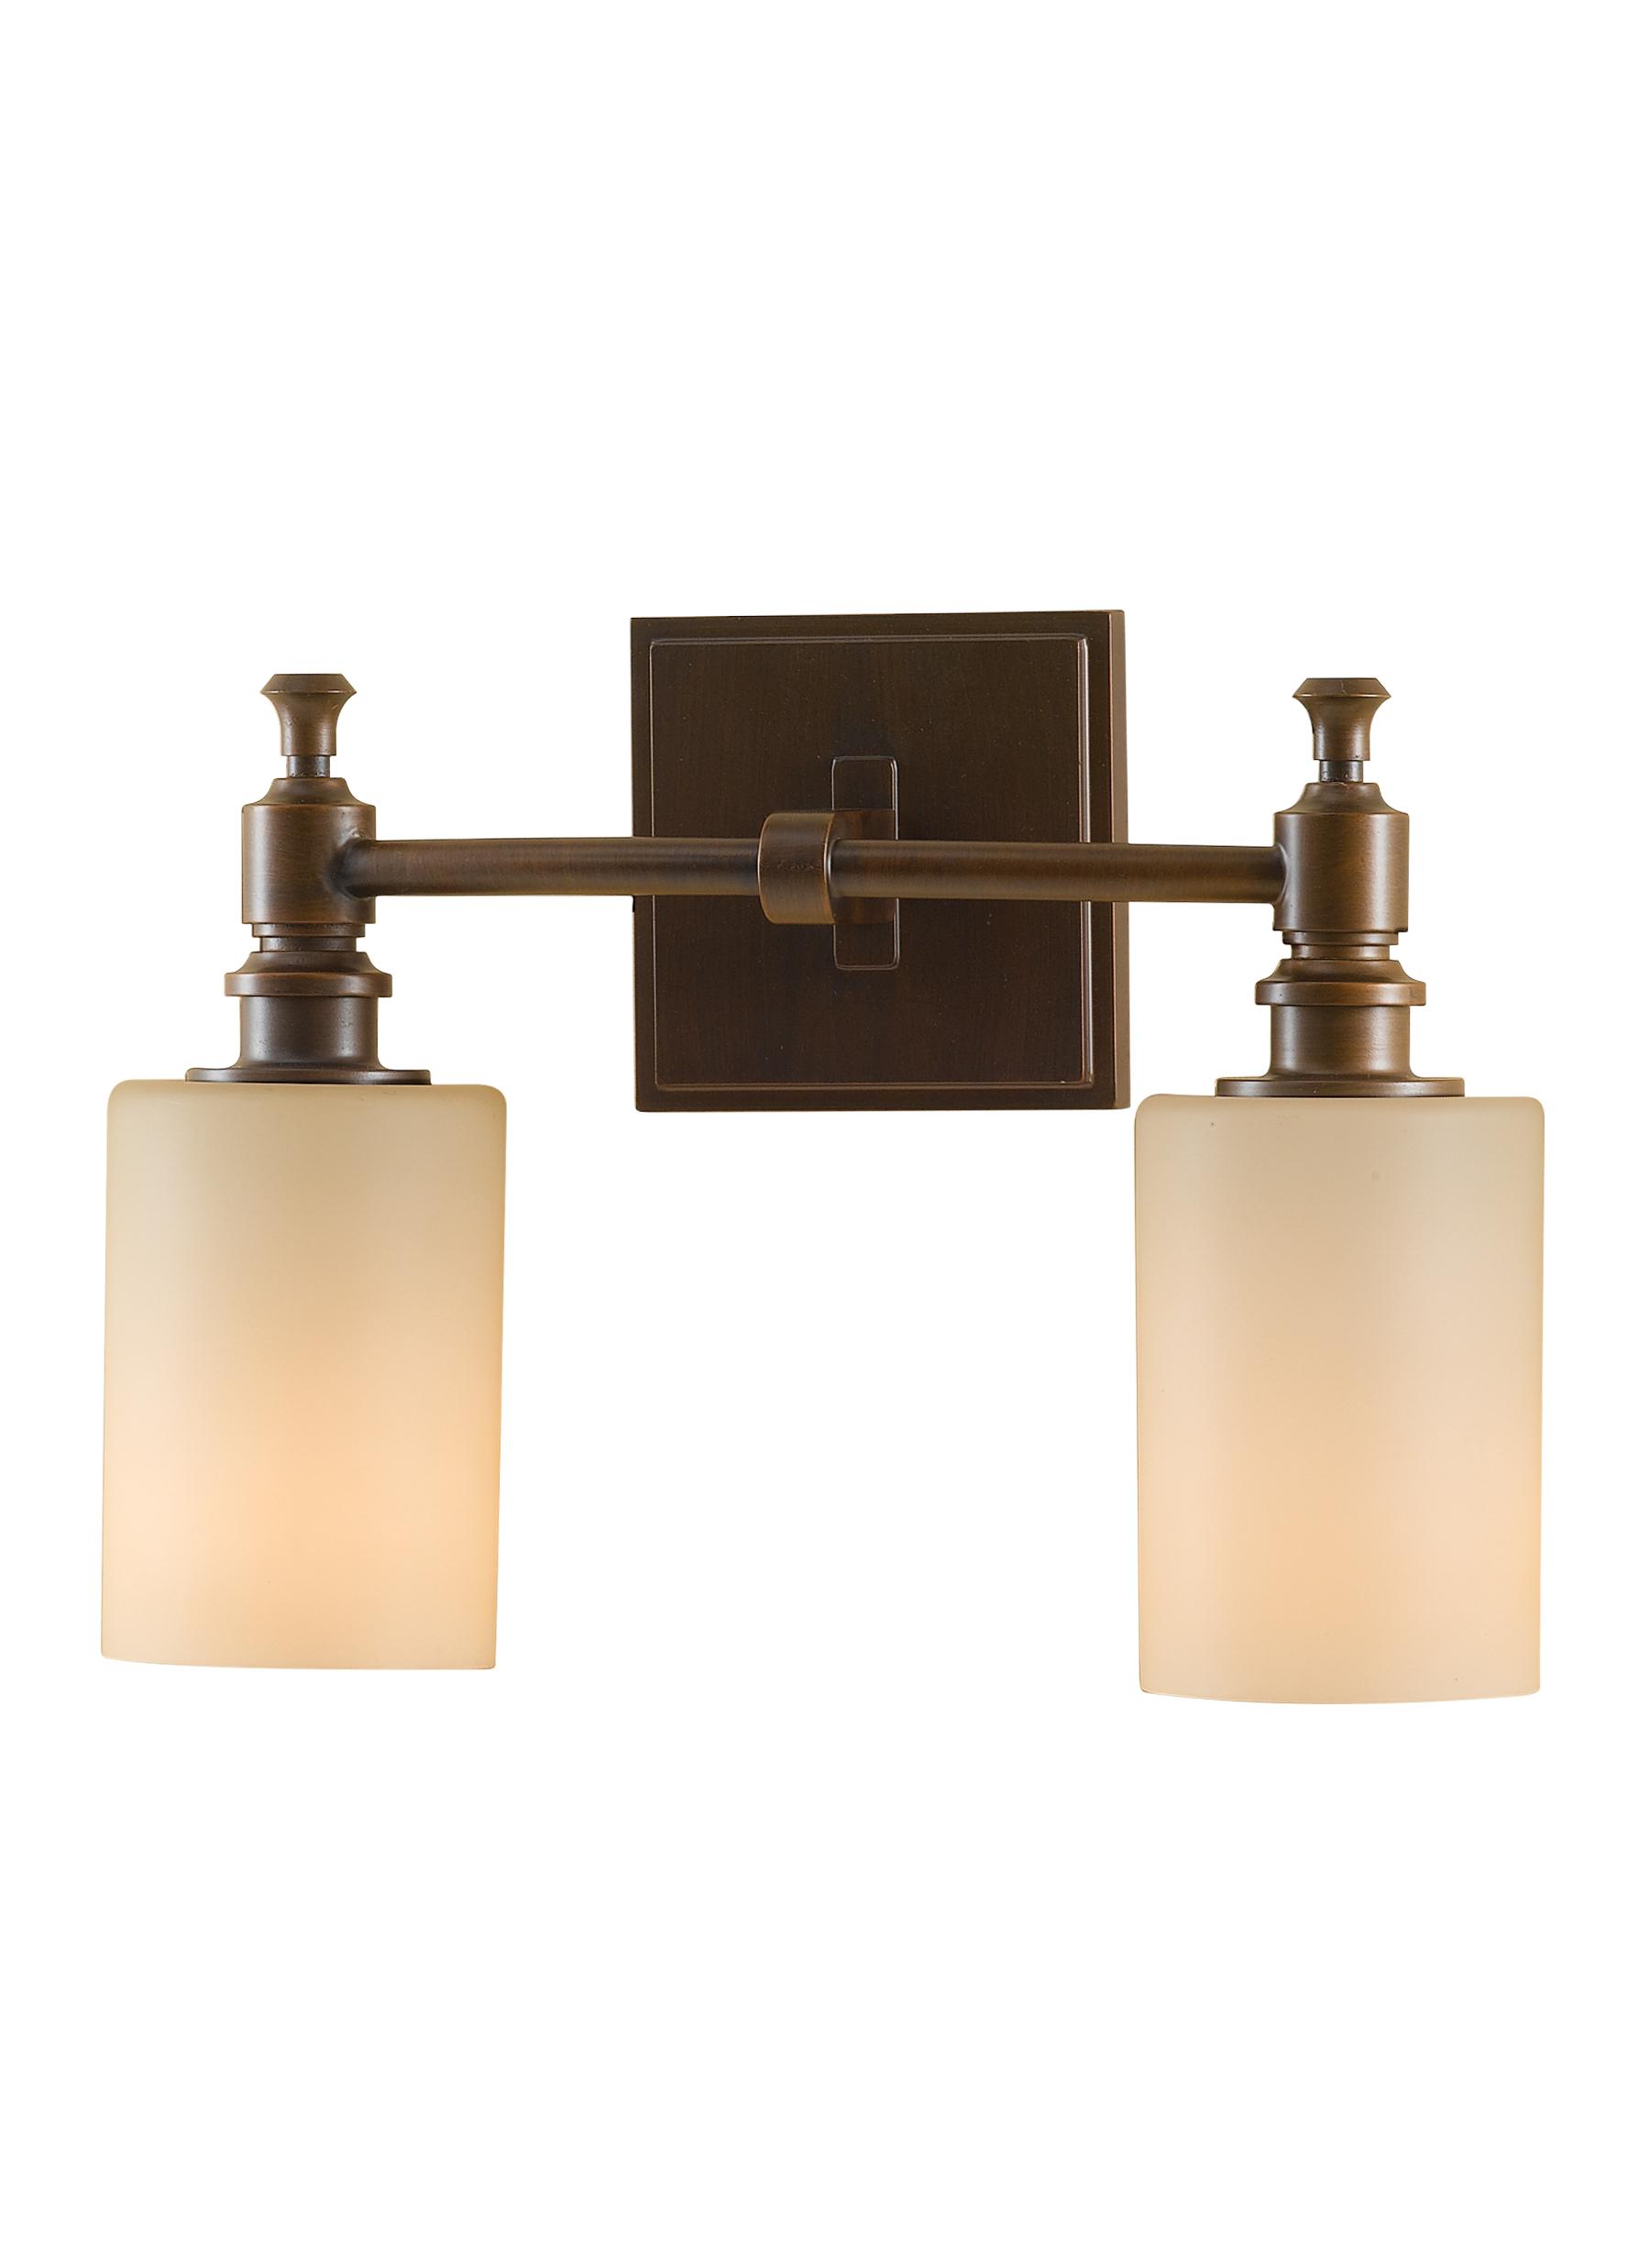 Vs16102 htbz2 light vanity fixtureheritage bronze loading zoom aloadofball Images